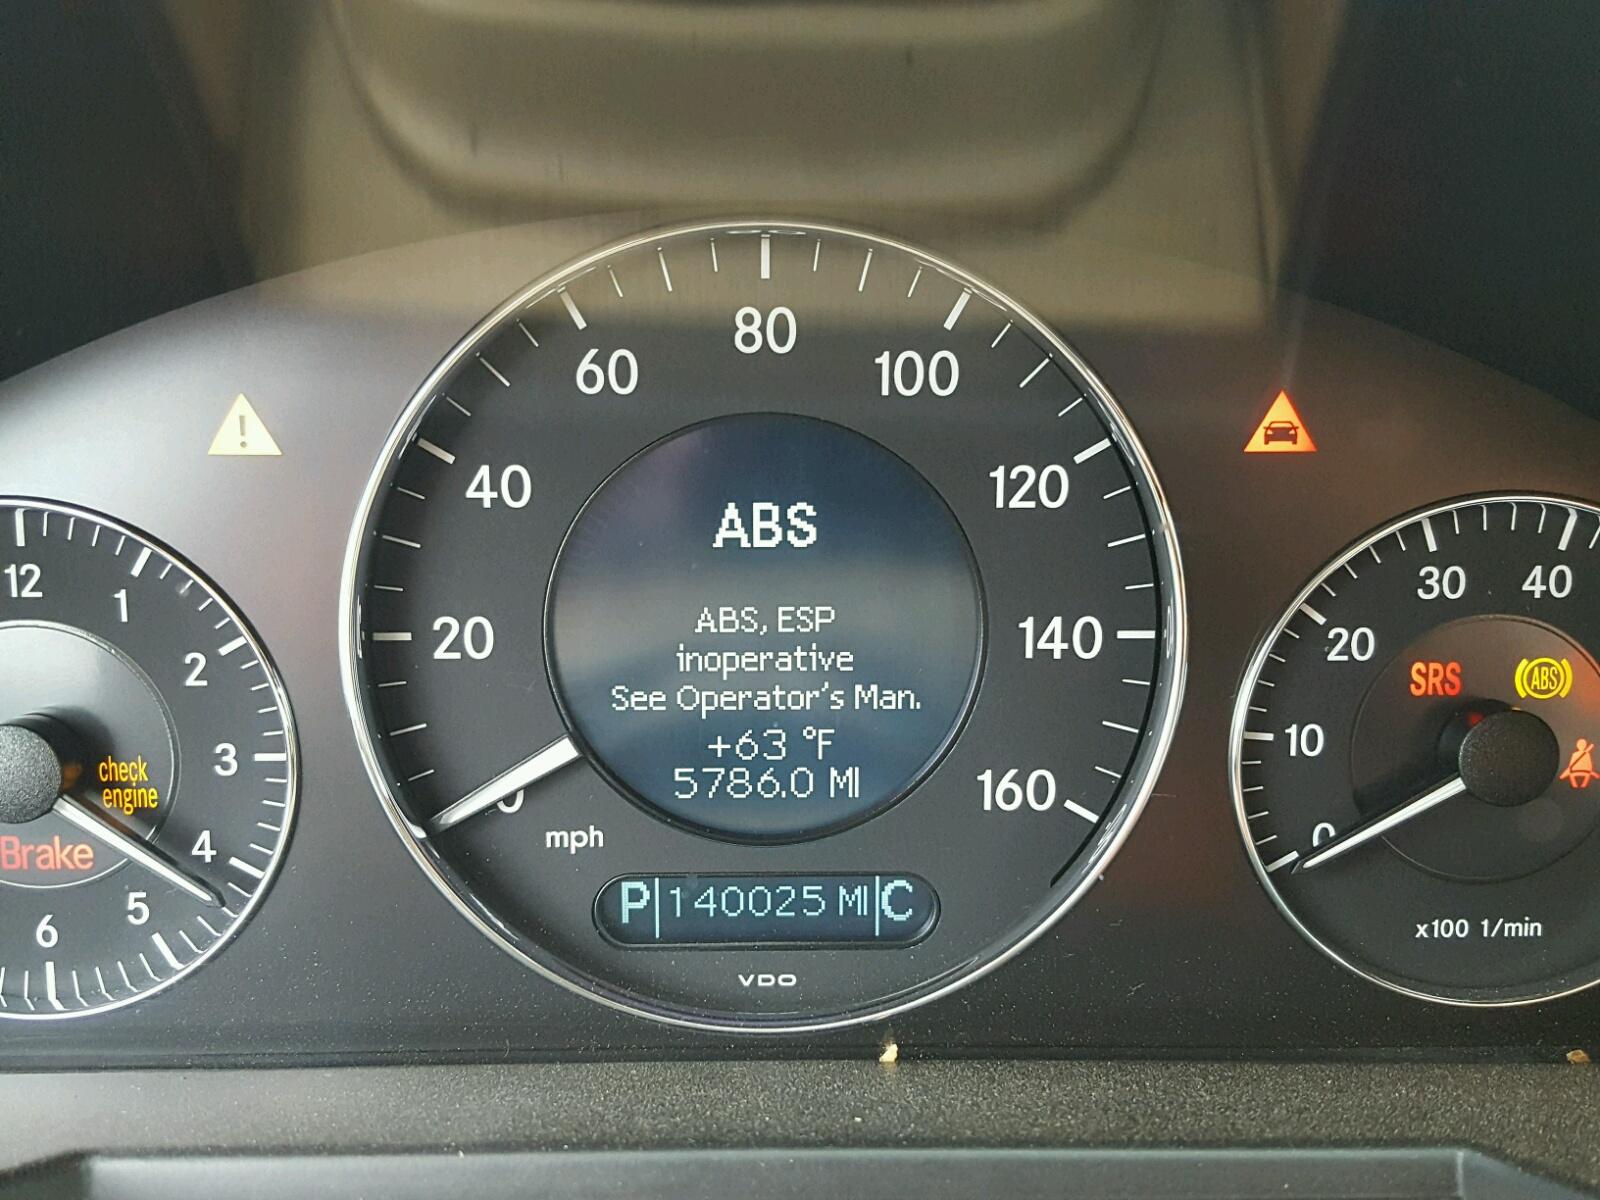 Abs Esp Inoperative Mercedes Benz ✓ The Mercedes Benz